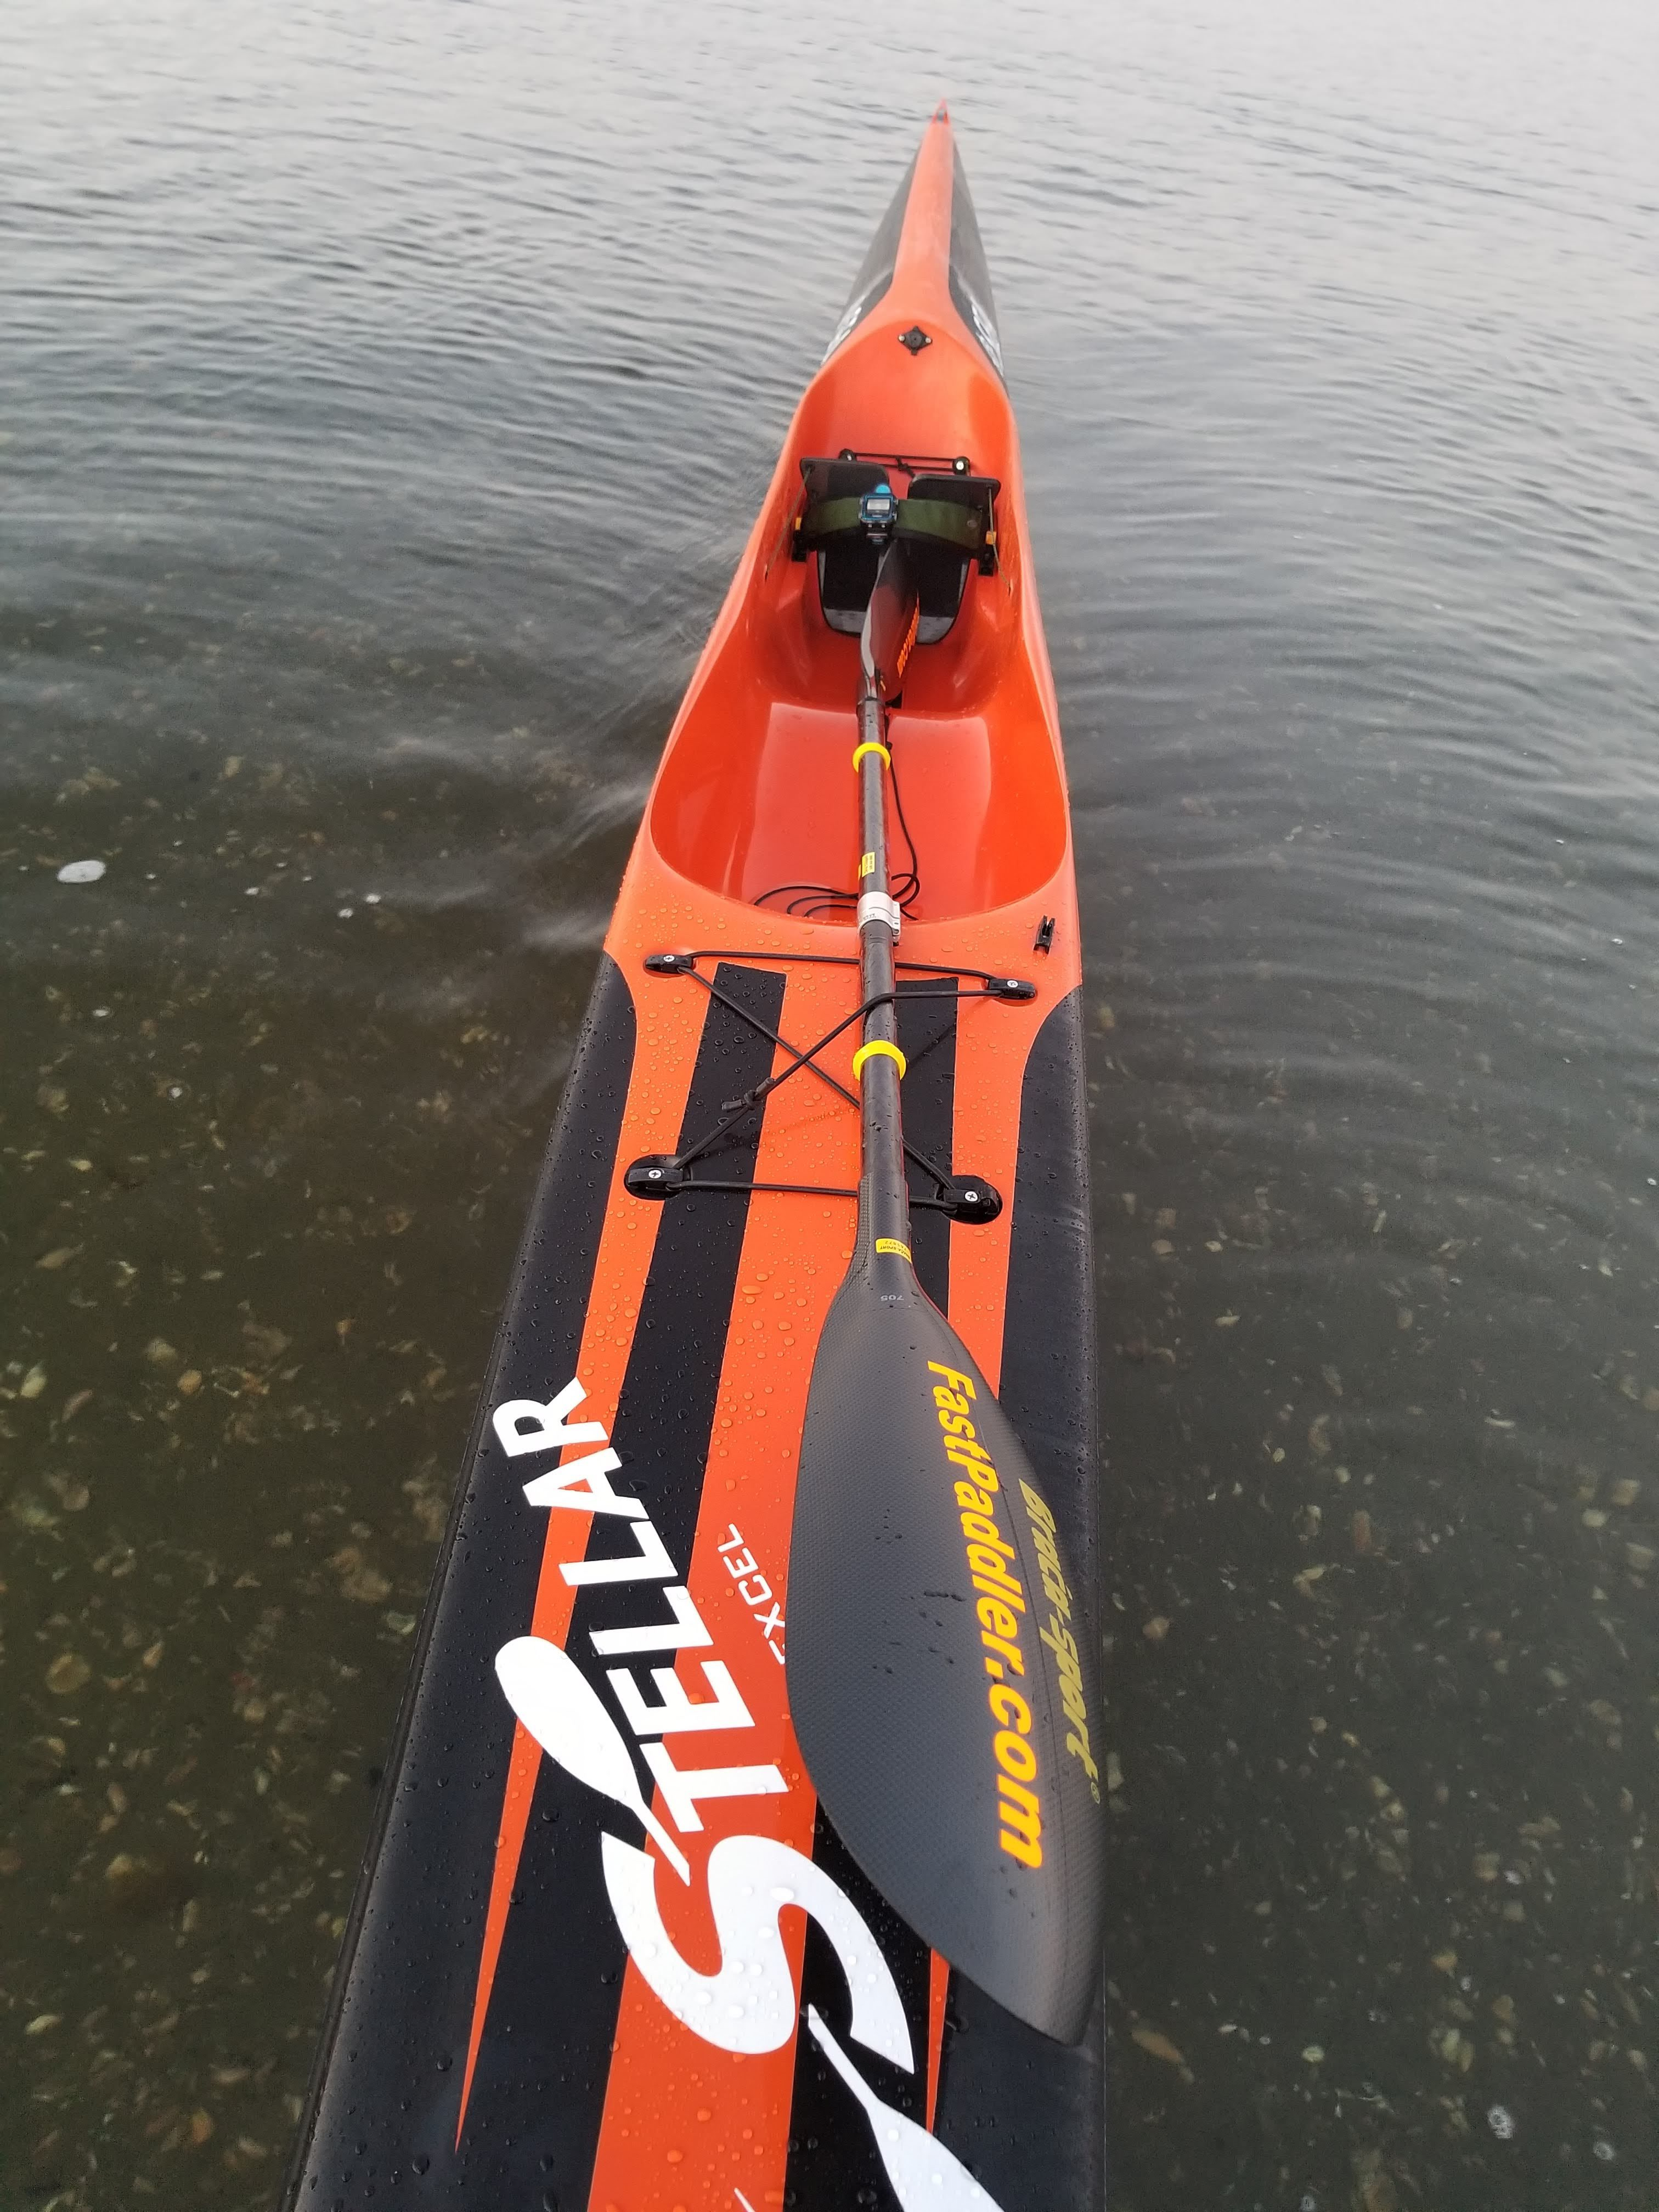 Stellar Elite Assassin (SEA) Surfski Flat Water Review